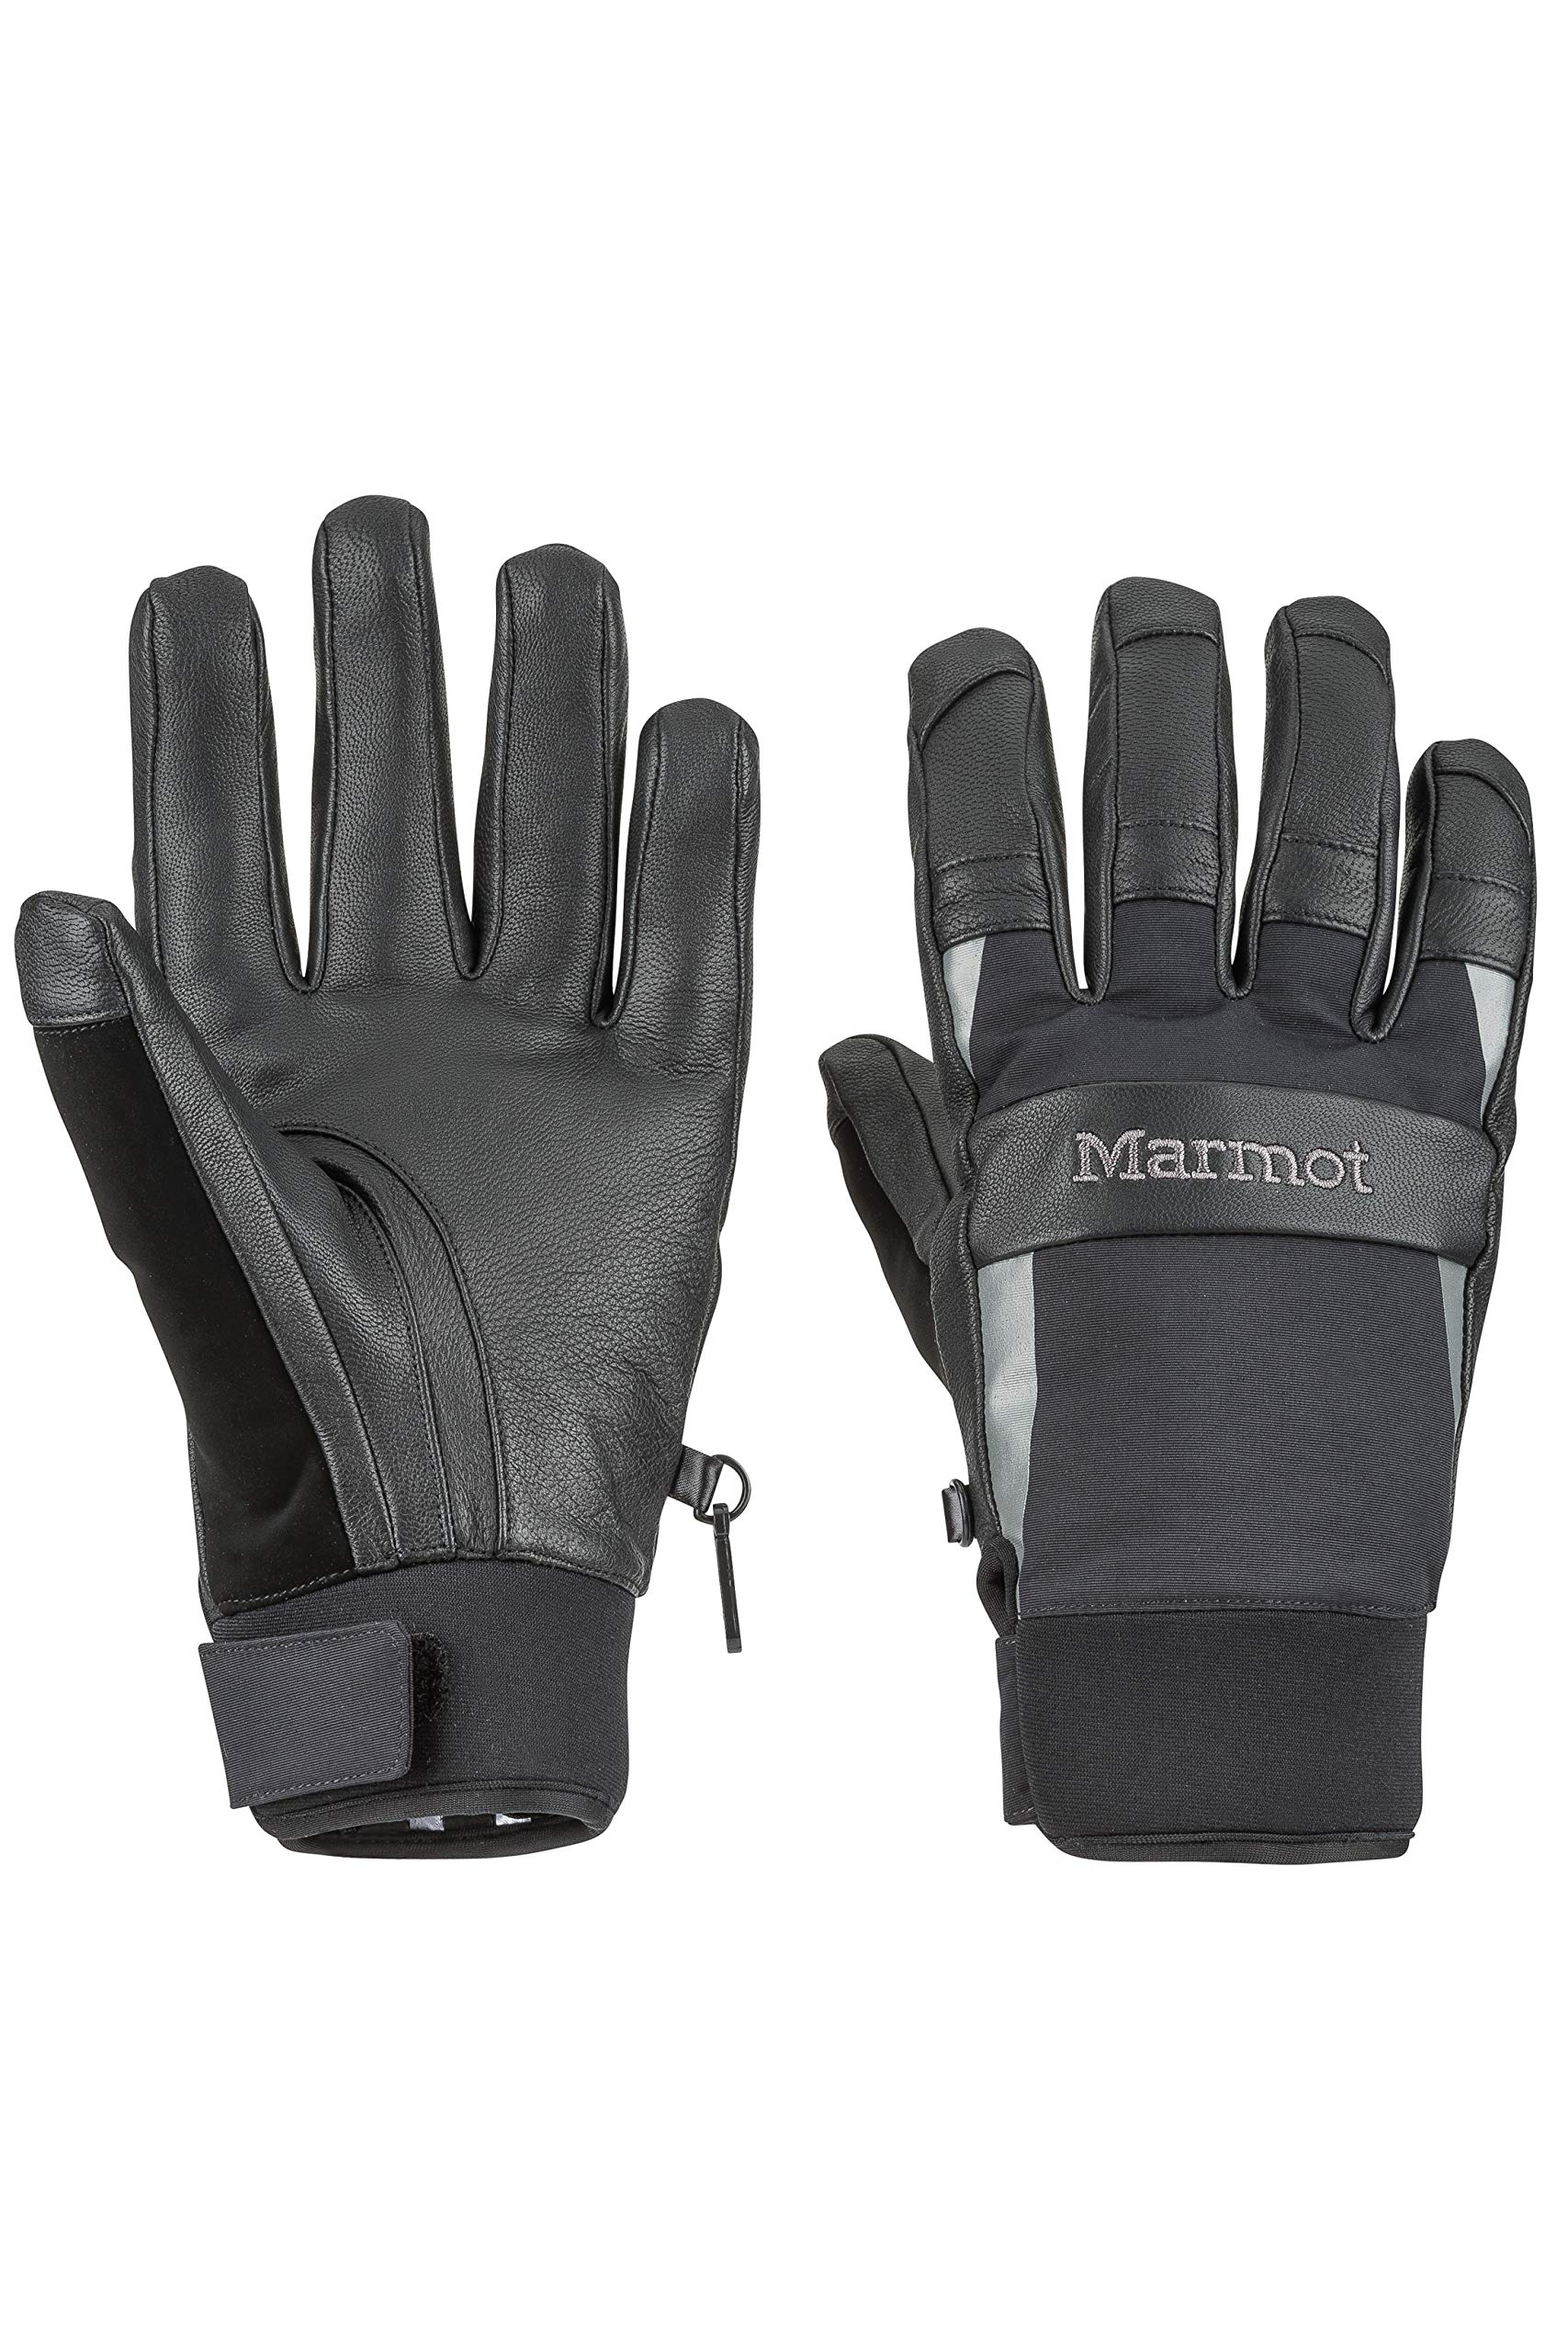 Marmot Men's Spring Glove, Large, Black